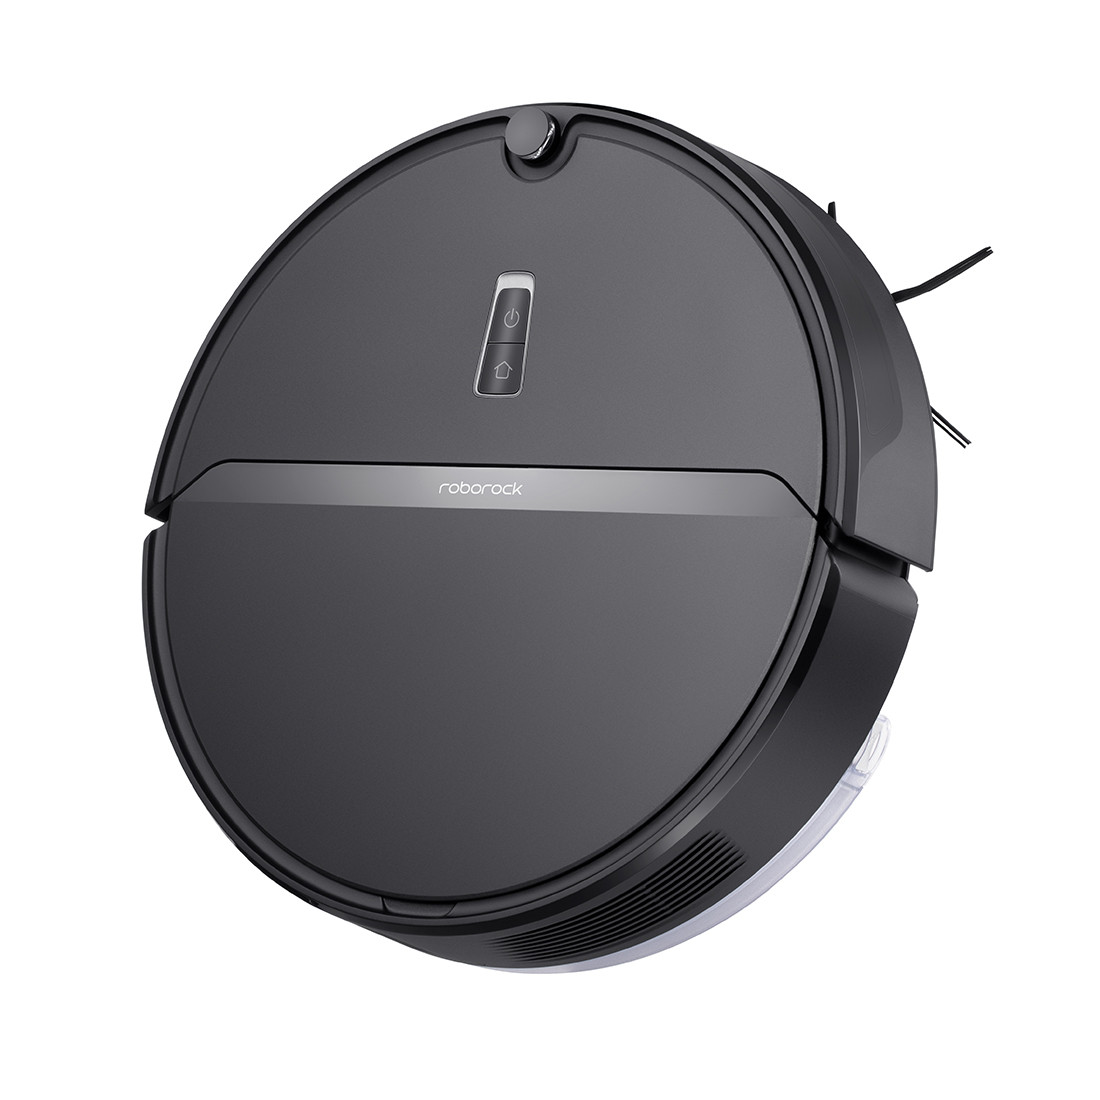 Робот-пылесос, Roborock, E4 /E452-00 / E452-02